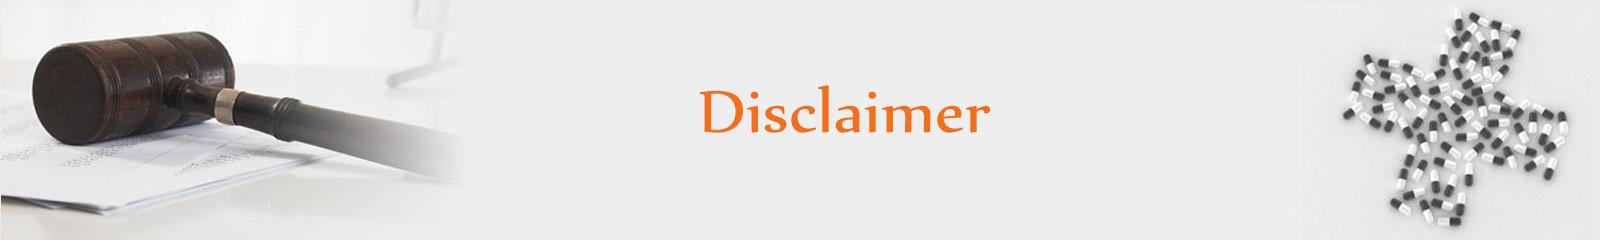 disclaimer_banner_img